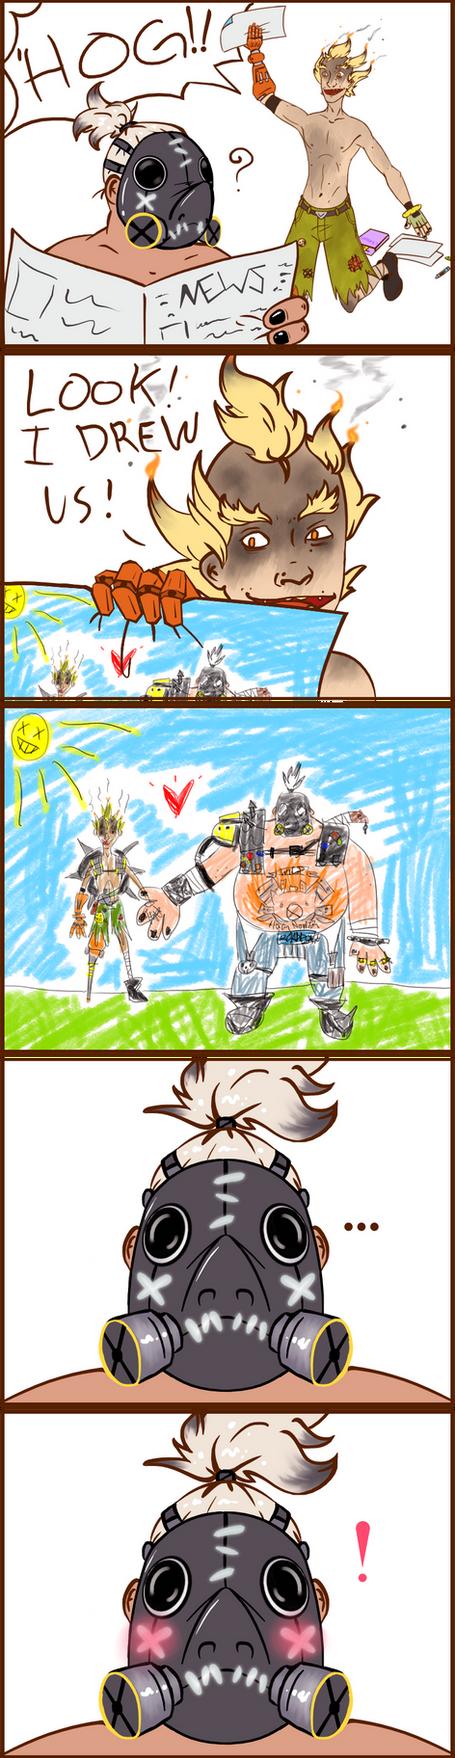 Junkrat/Roadhog comic by JawYaw